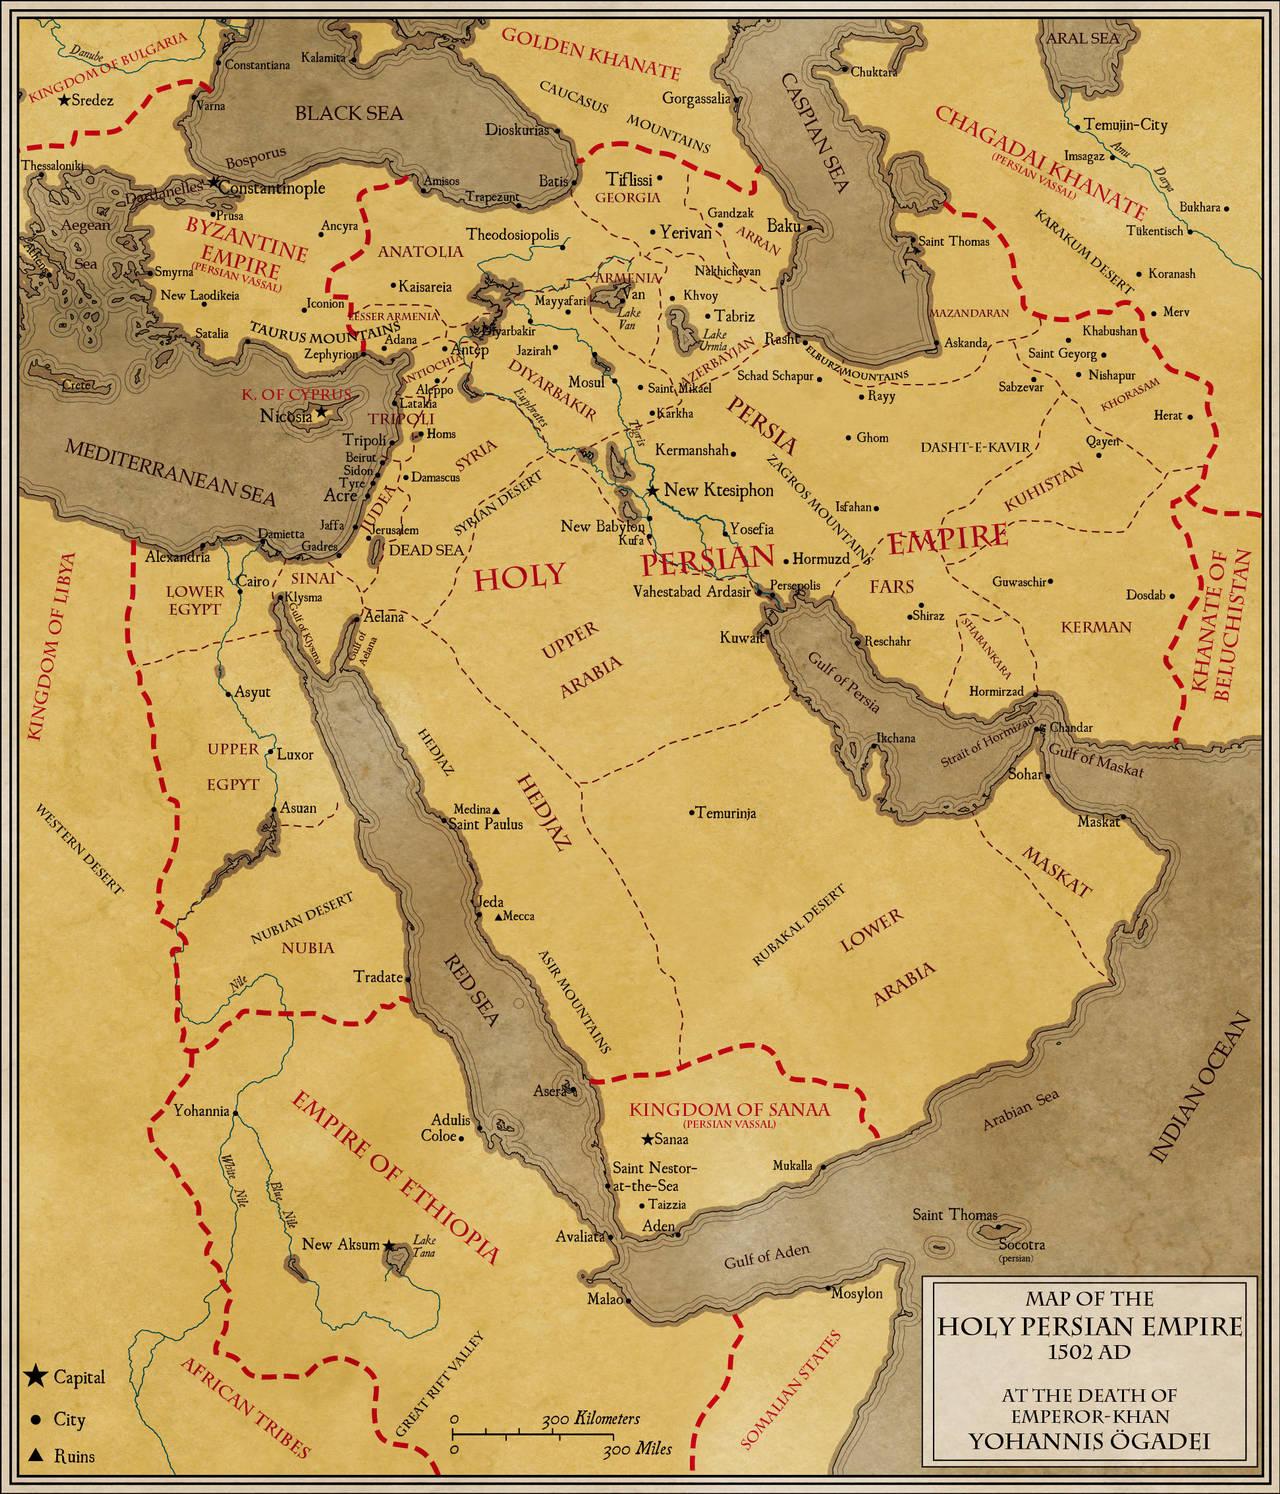 Persian Empire: Holy Persian Empire By Sapiento On DeviantArt